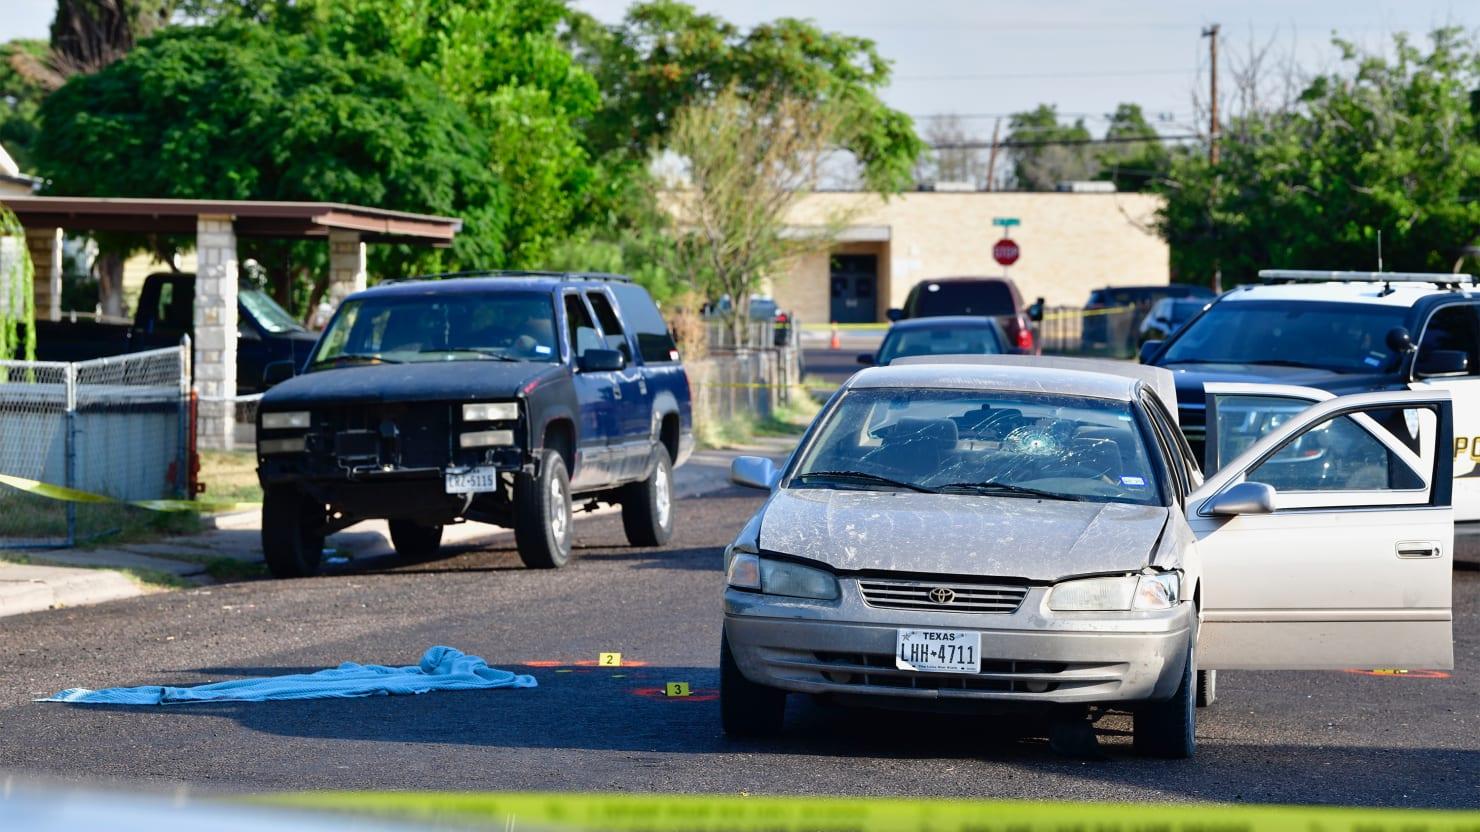 West Texas Shooting Spree Leaves 7 Dead, Scores Injured; Gunman Killed